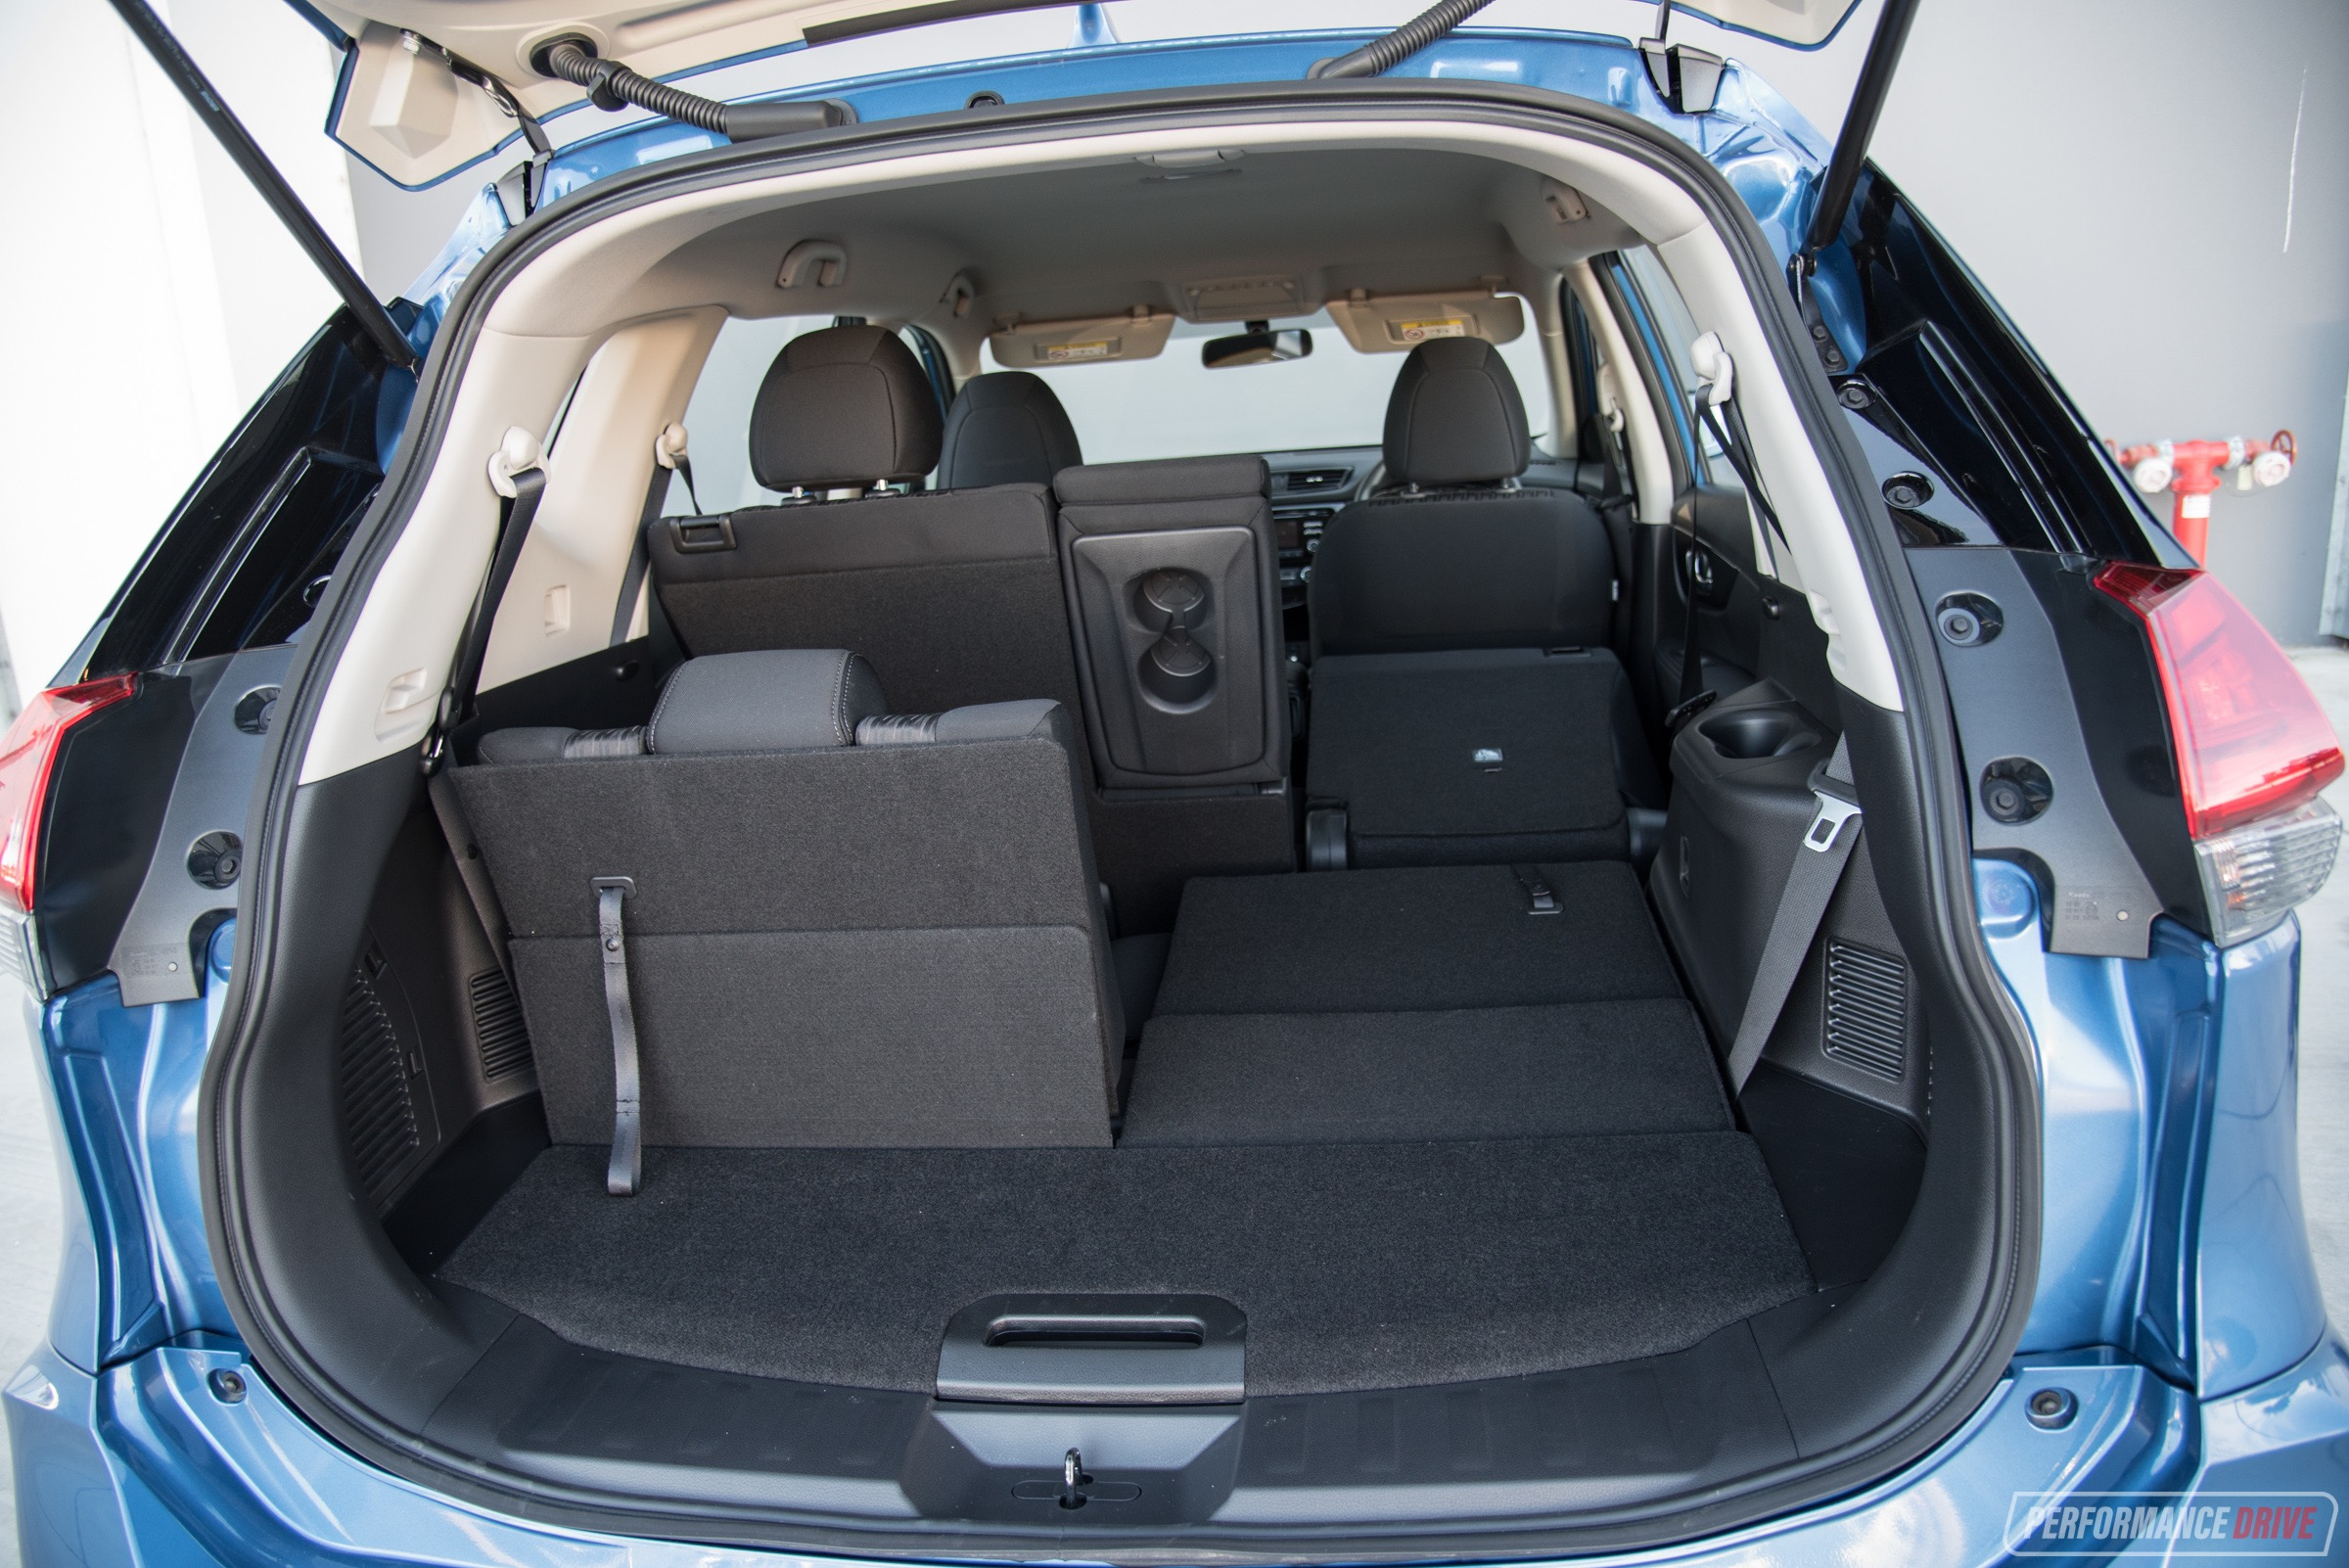 Mazda Cx 5 Cargo >> 2017 Nissan X-Trail ST review (video) | PerformanceDrive